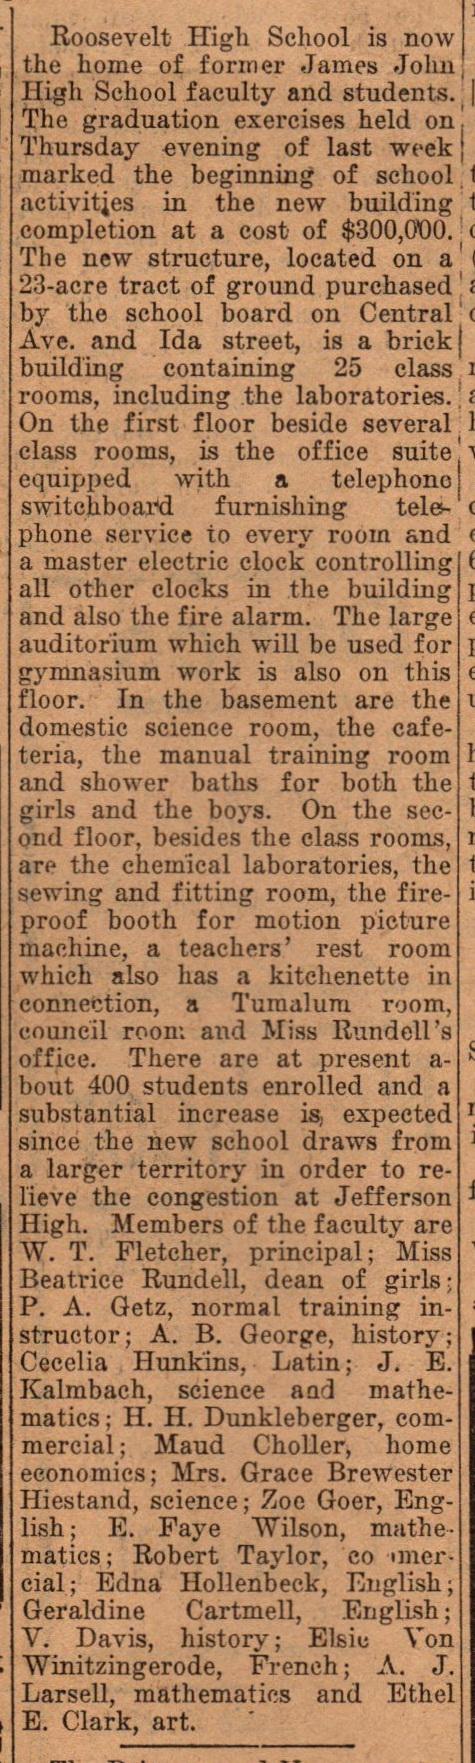 new-roosevelt-high-school-opened-jan-25-1923-2